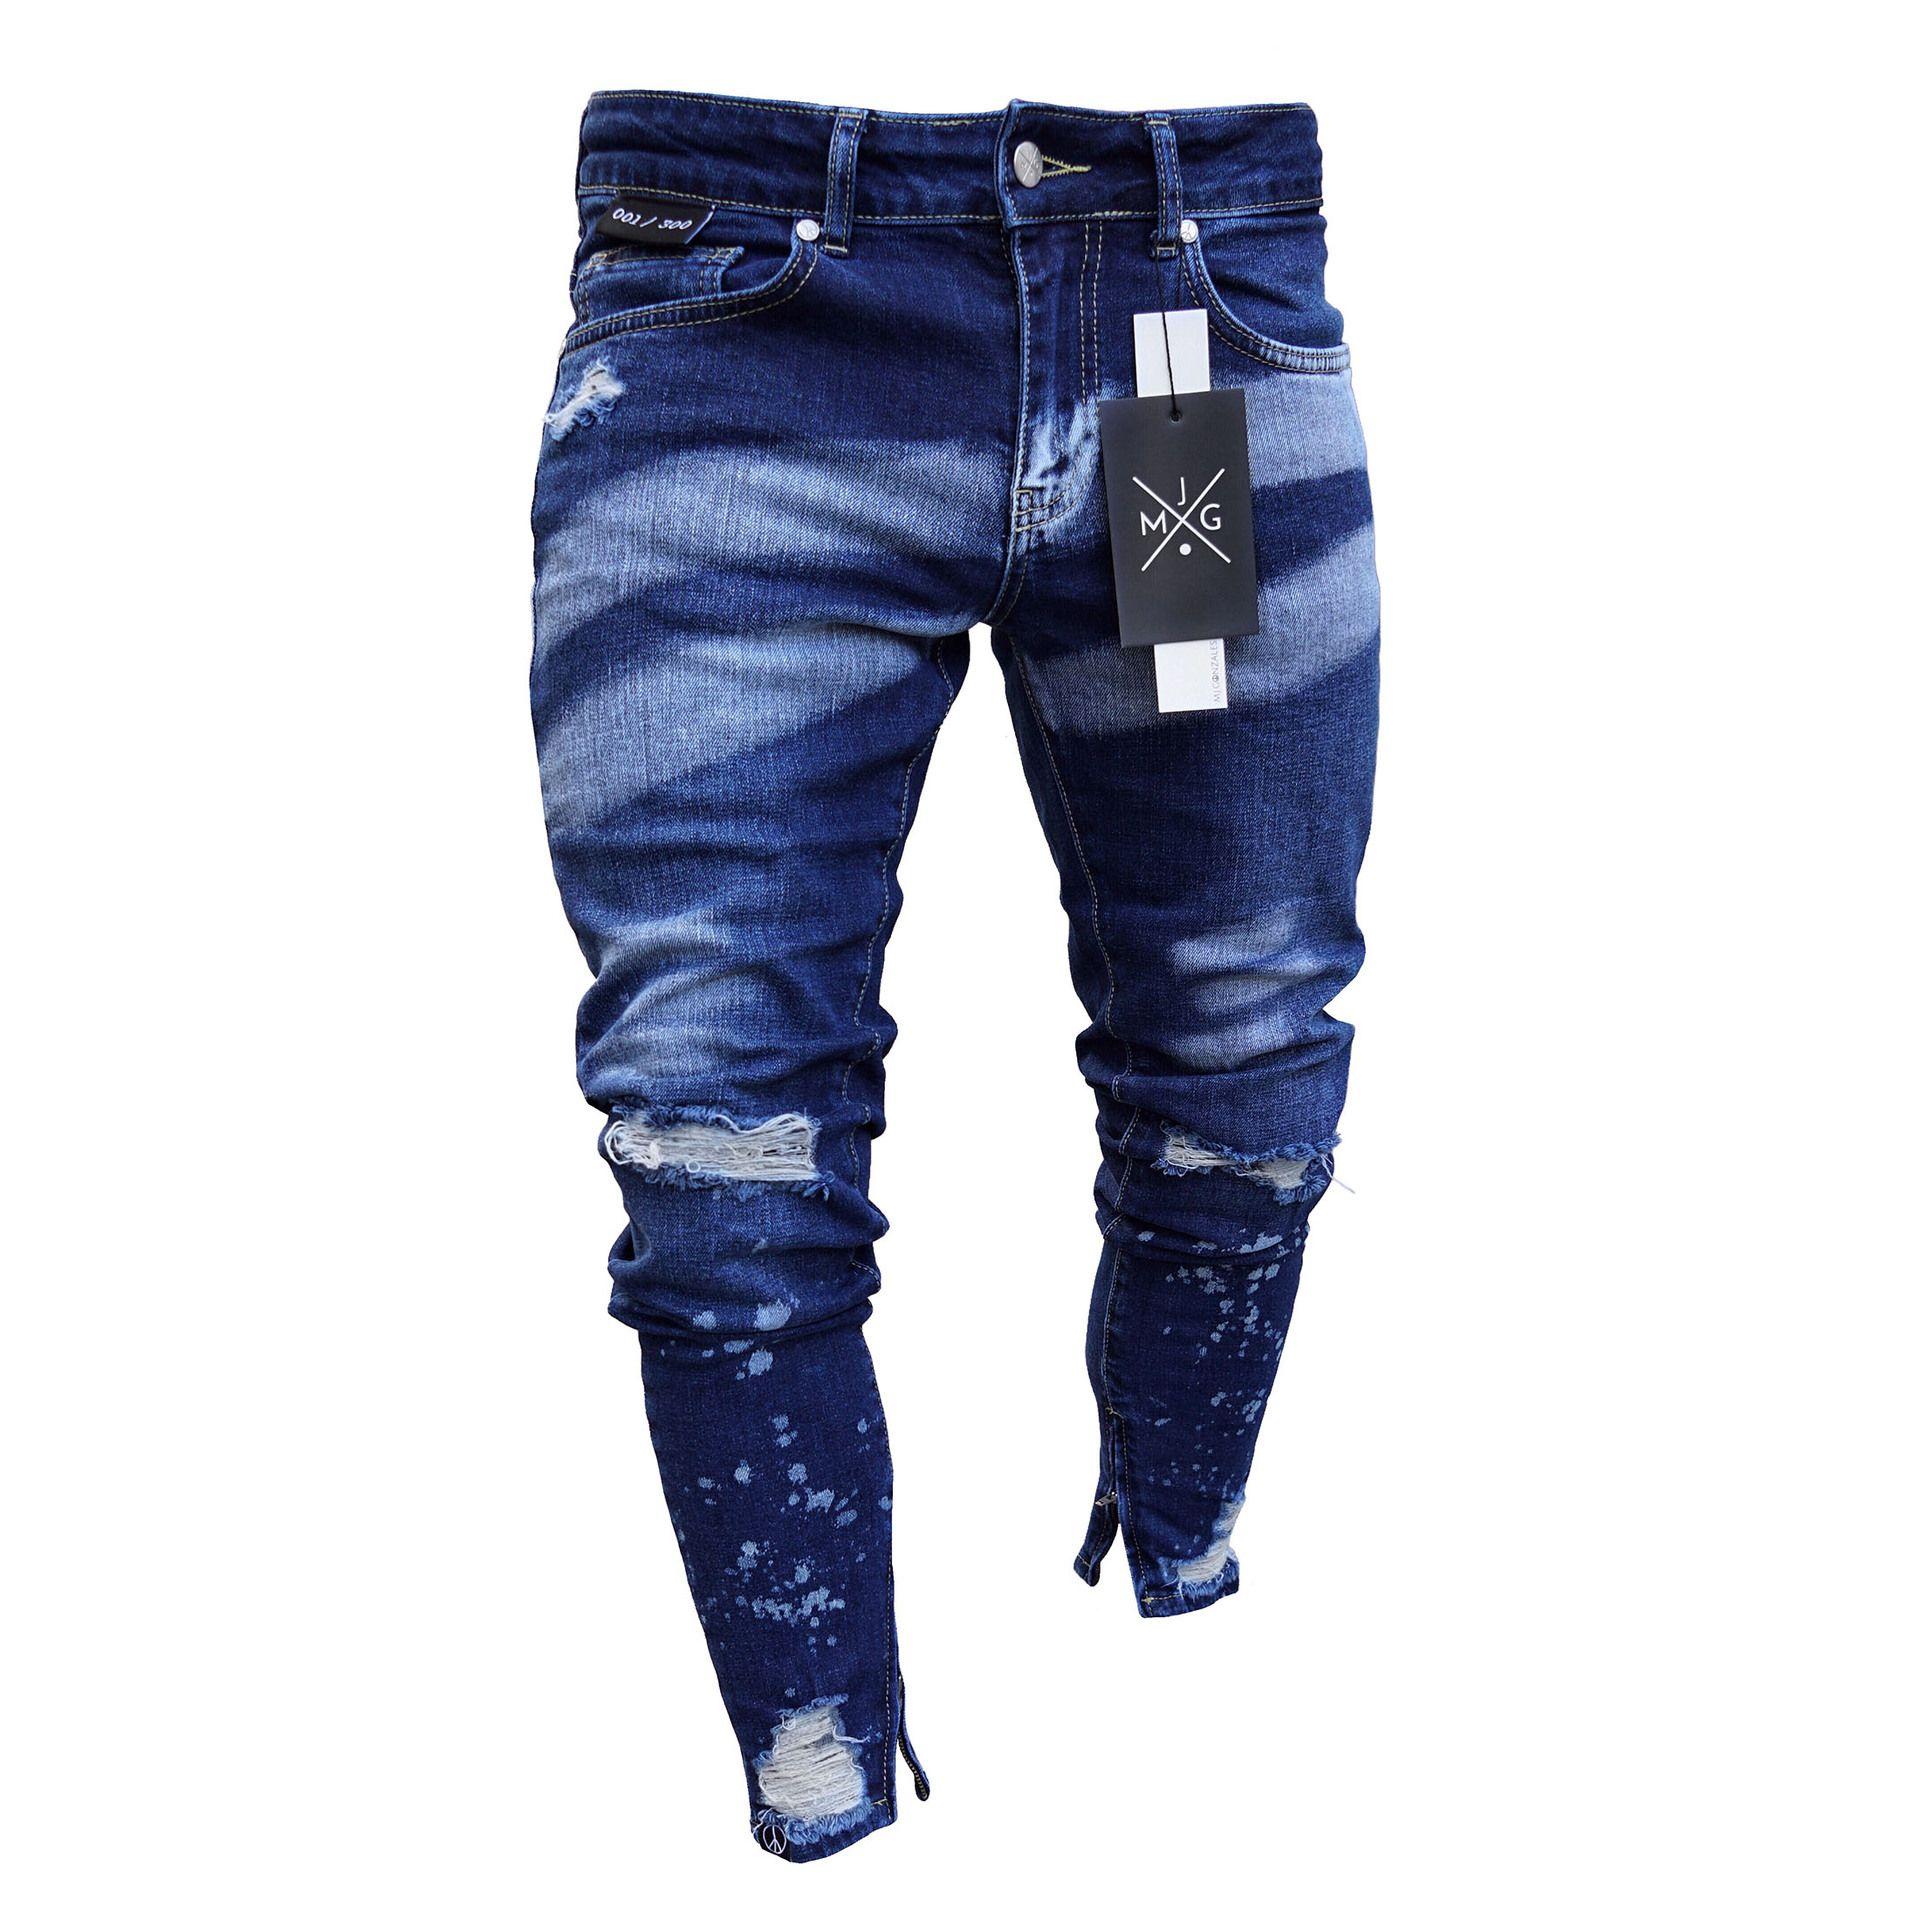 1449814314d1e Compre Azul Lavado Jeans Para Hombre Ropa Gradiente De Color Lápiz ...